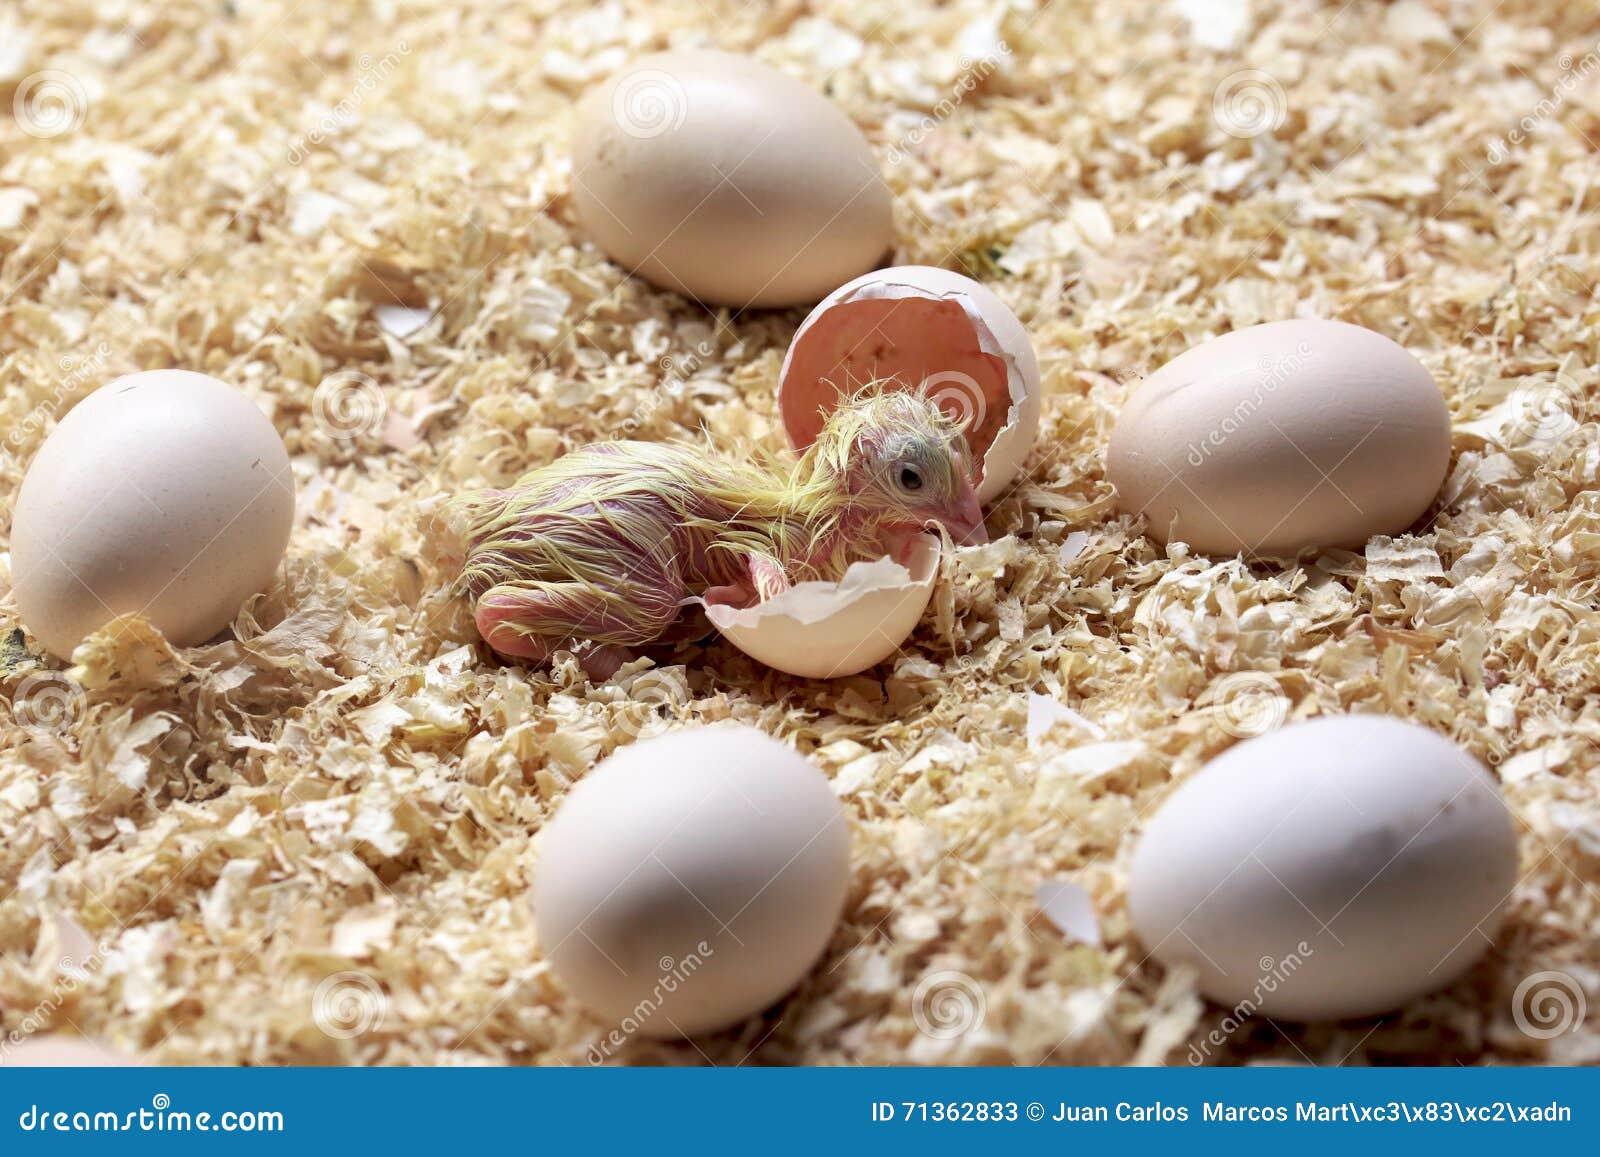 A chick newborn